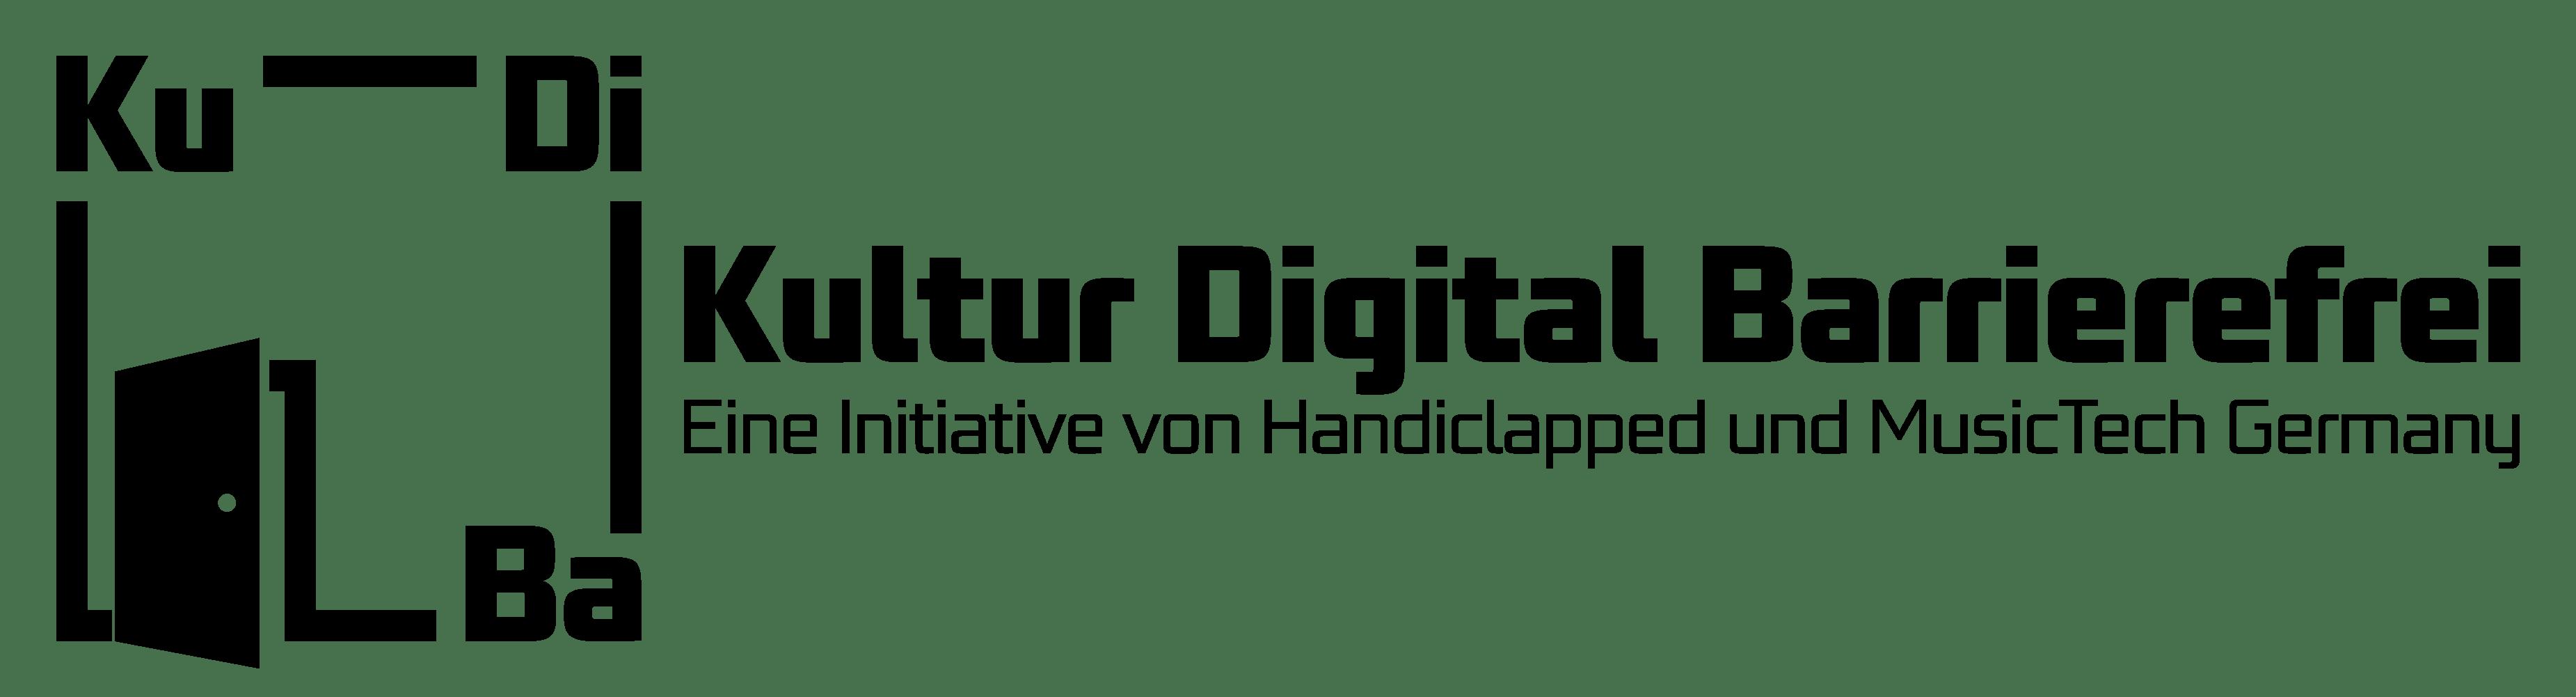 Logo KuDiBa - Kultur Digital Barrierefrei